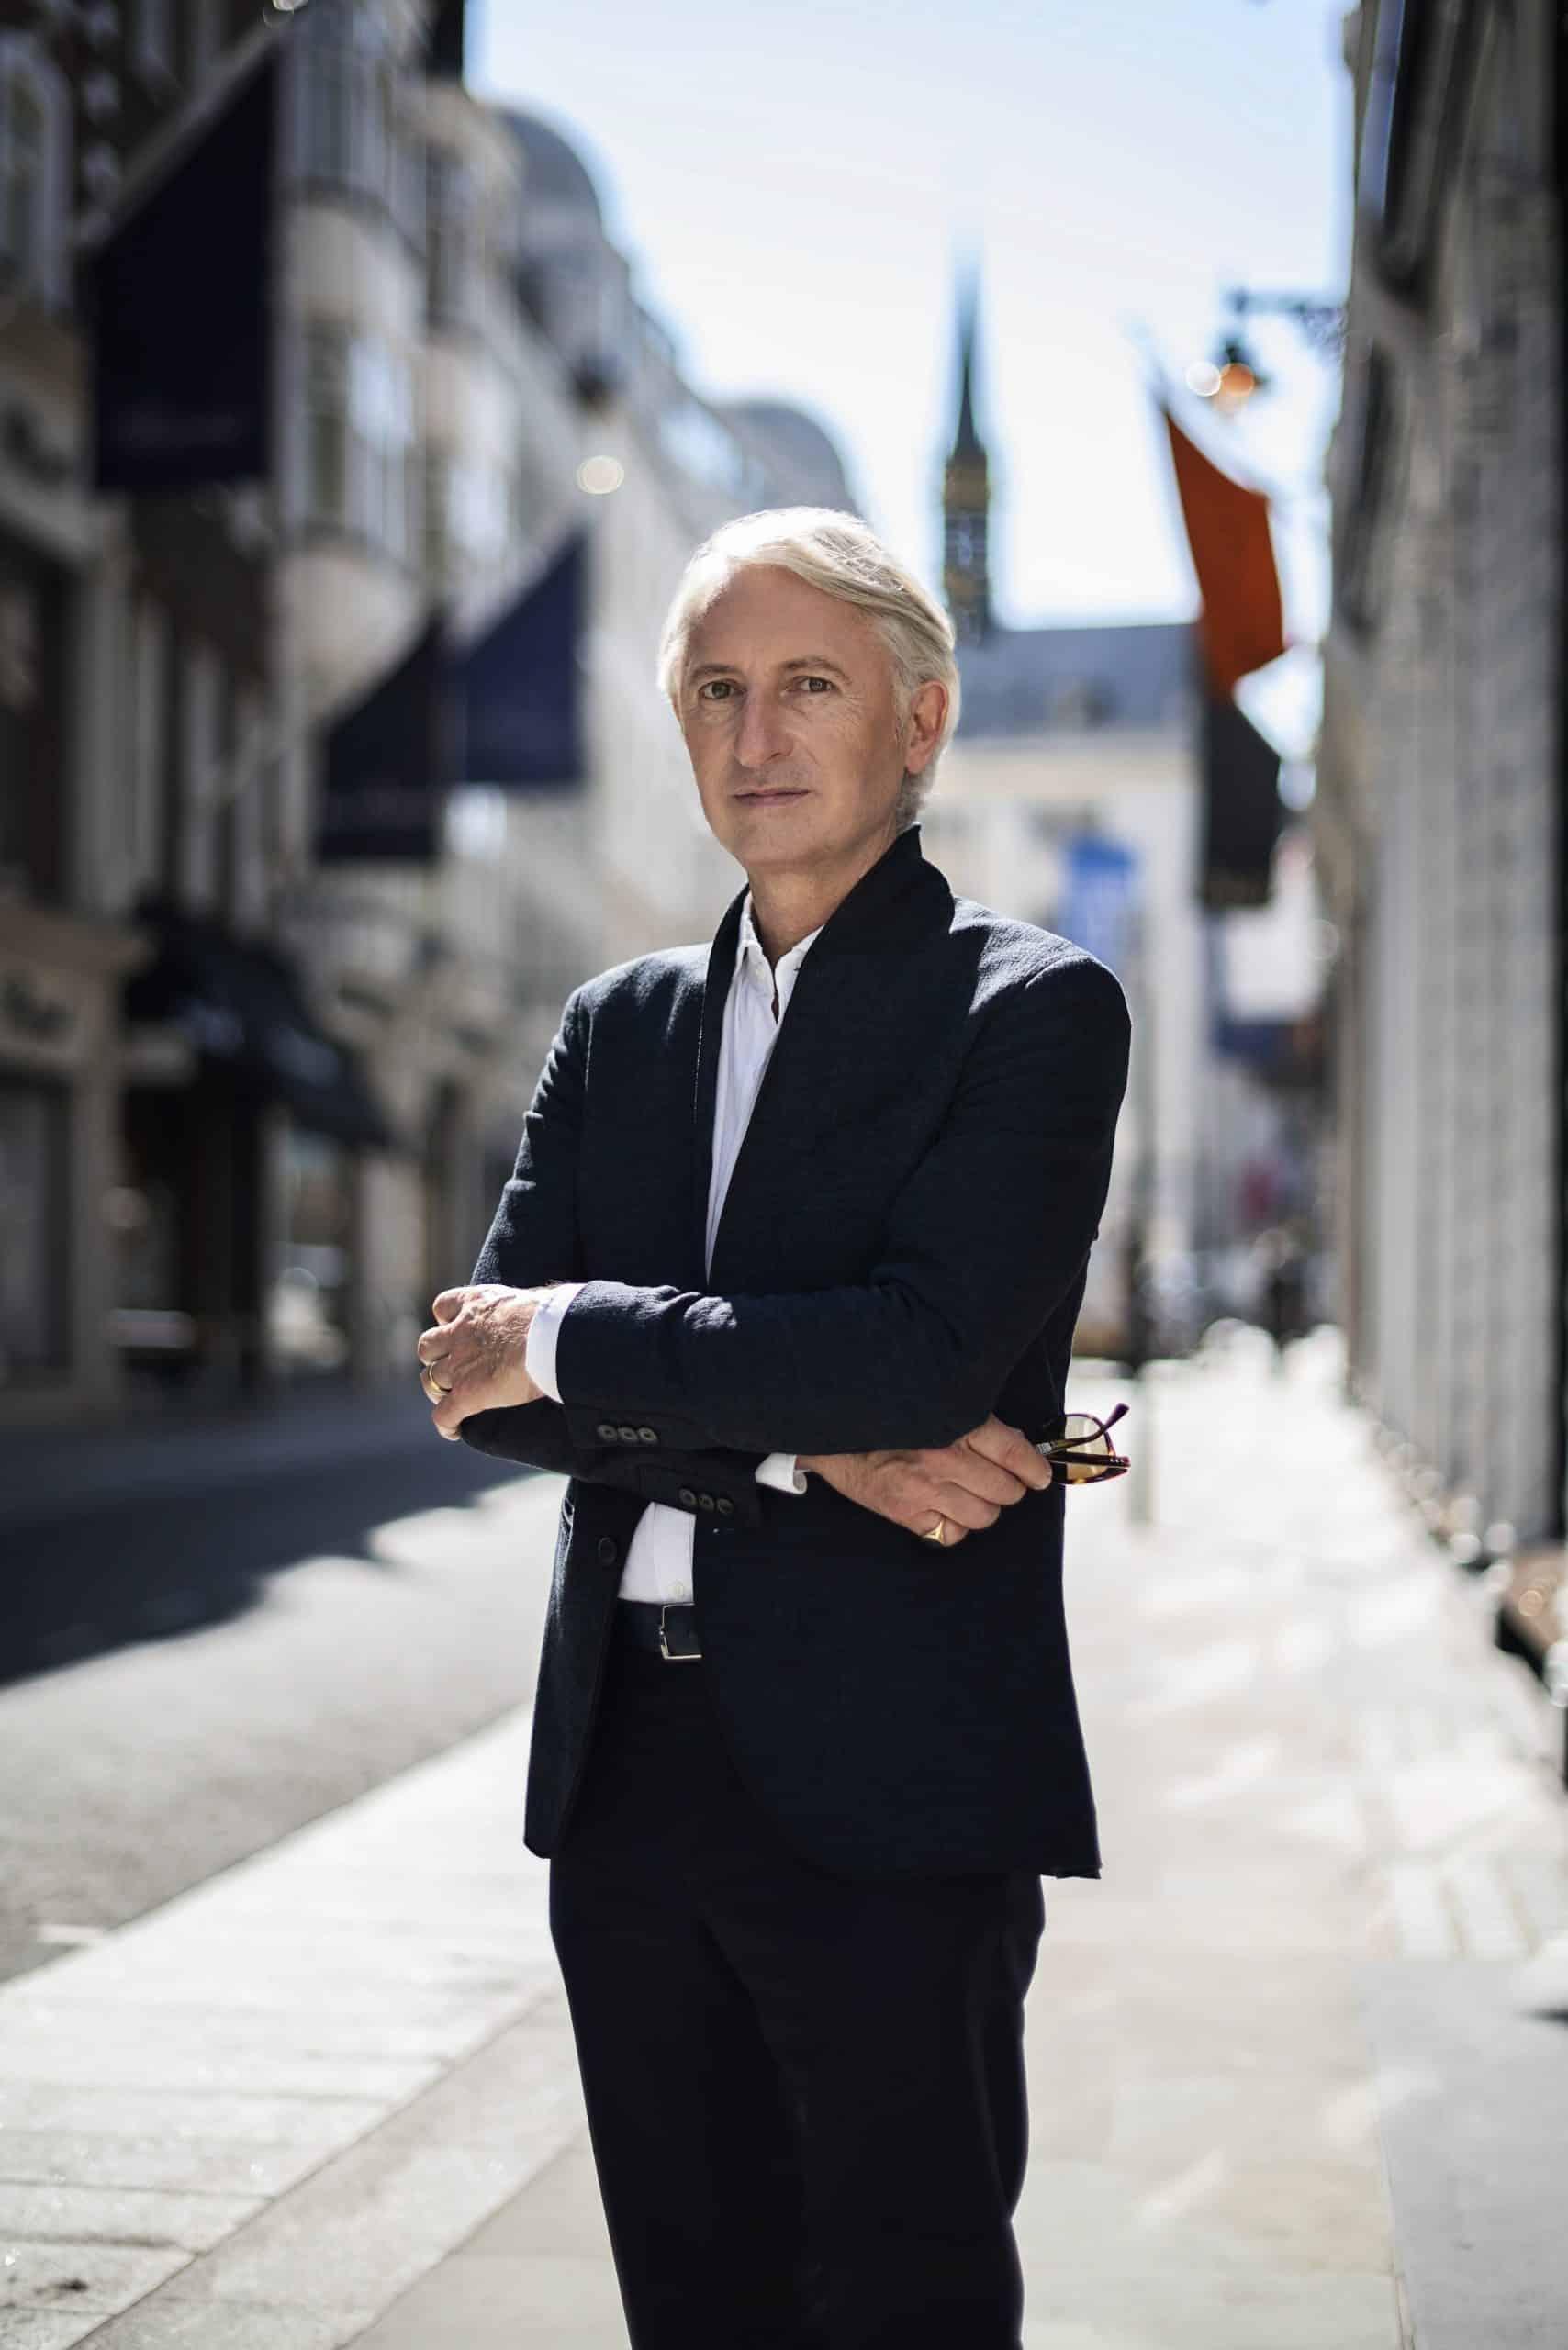 David Warren joins Moussaieff Jewellers as CEO